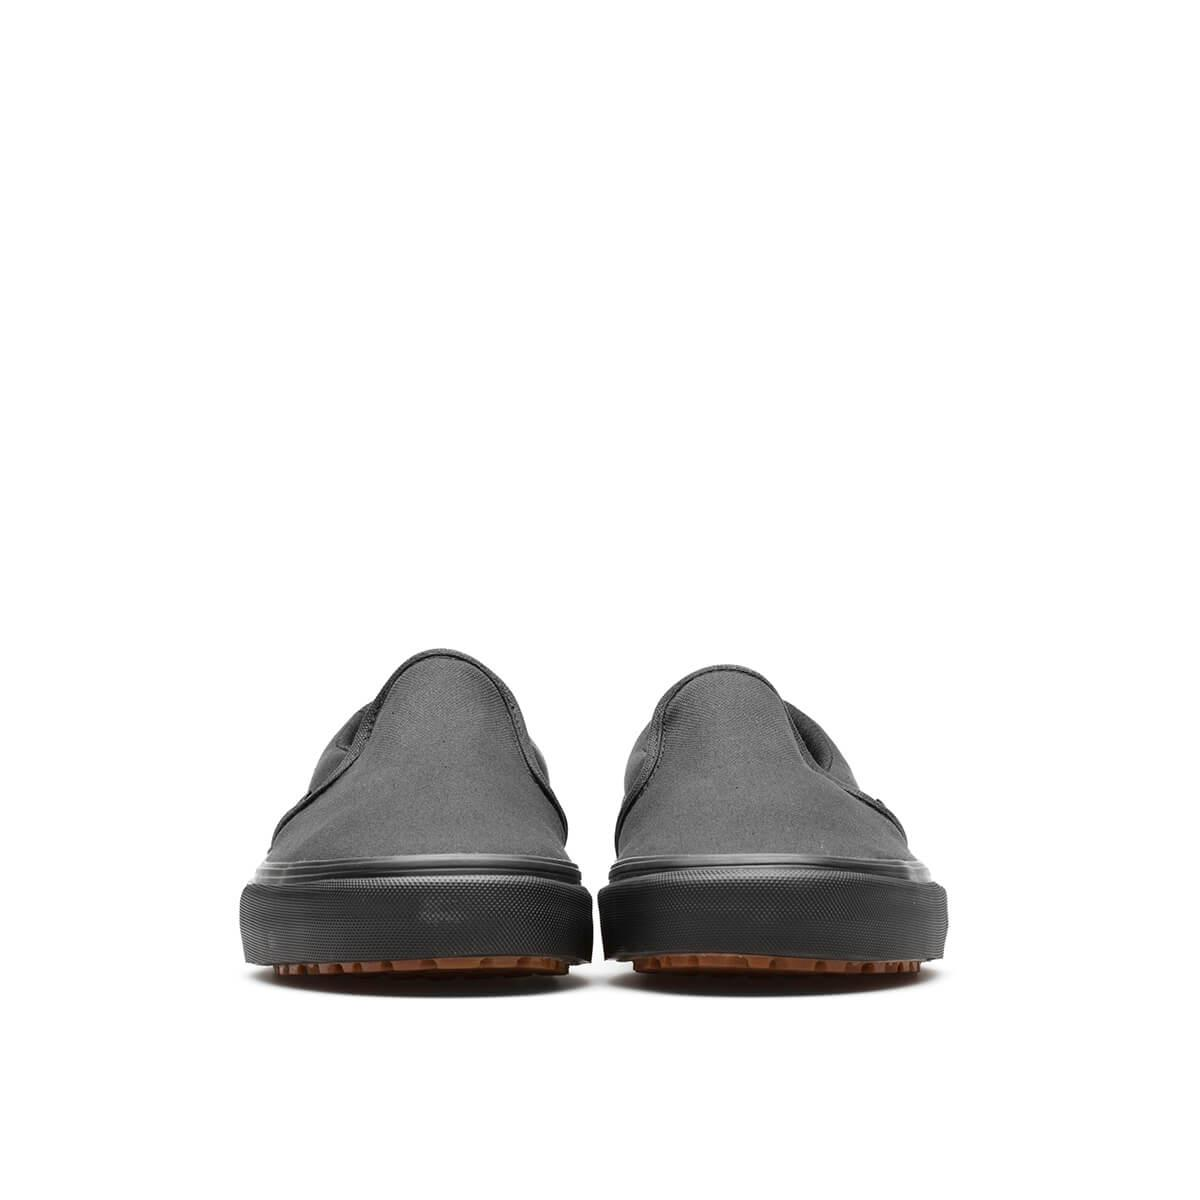 Vans Canvas Slip-on Uc in Black for Men